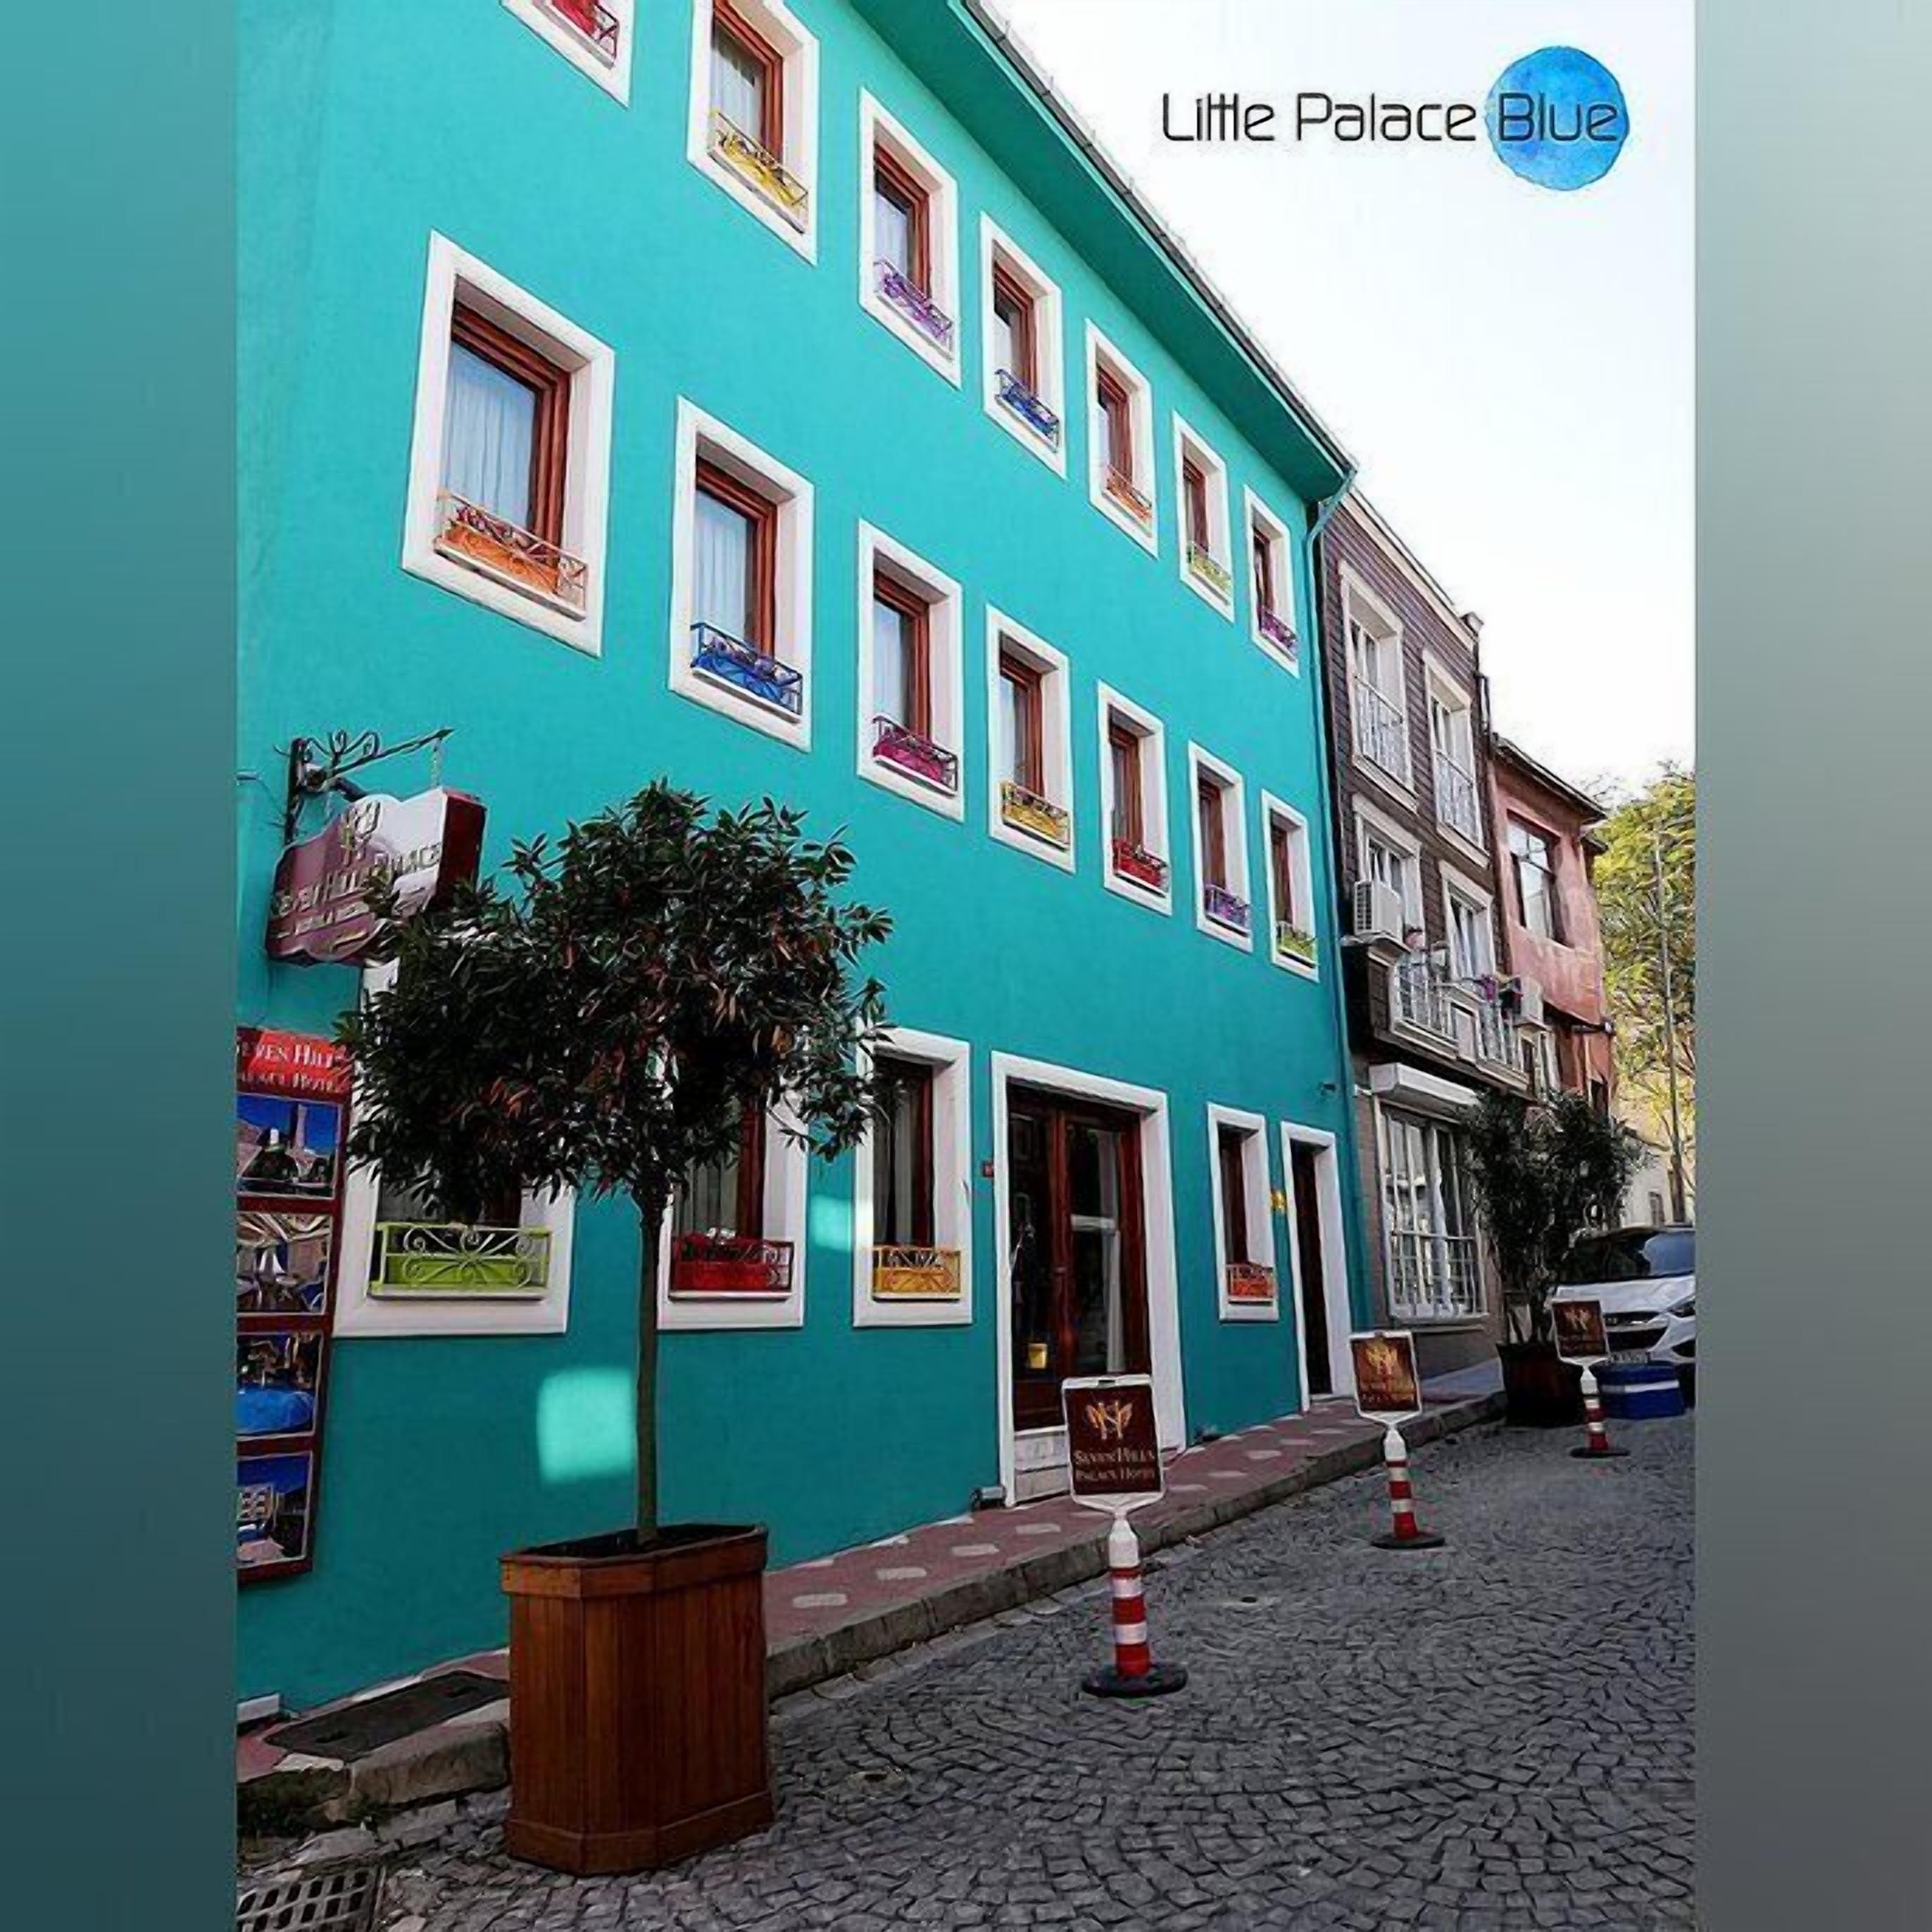 Little Palace Blue